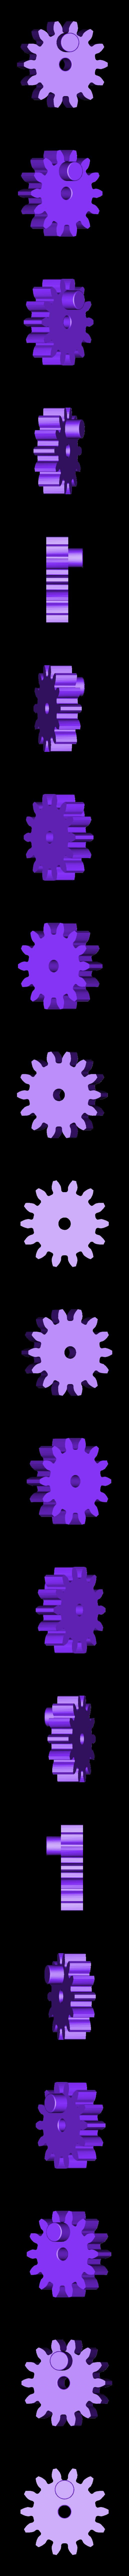 gear_M15x14.STL Download free STL file party parrot automata • 3D printable design, melonshu